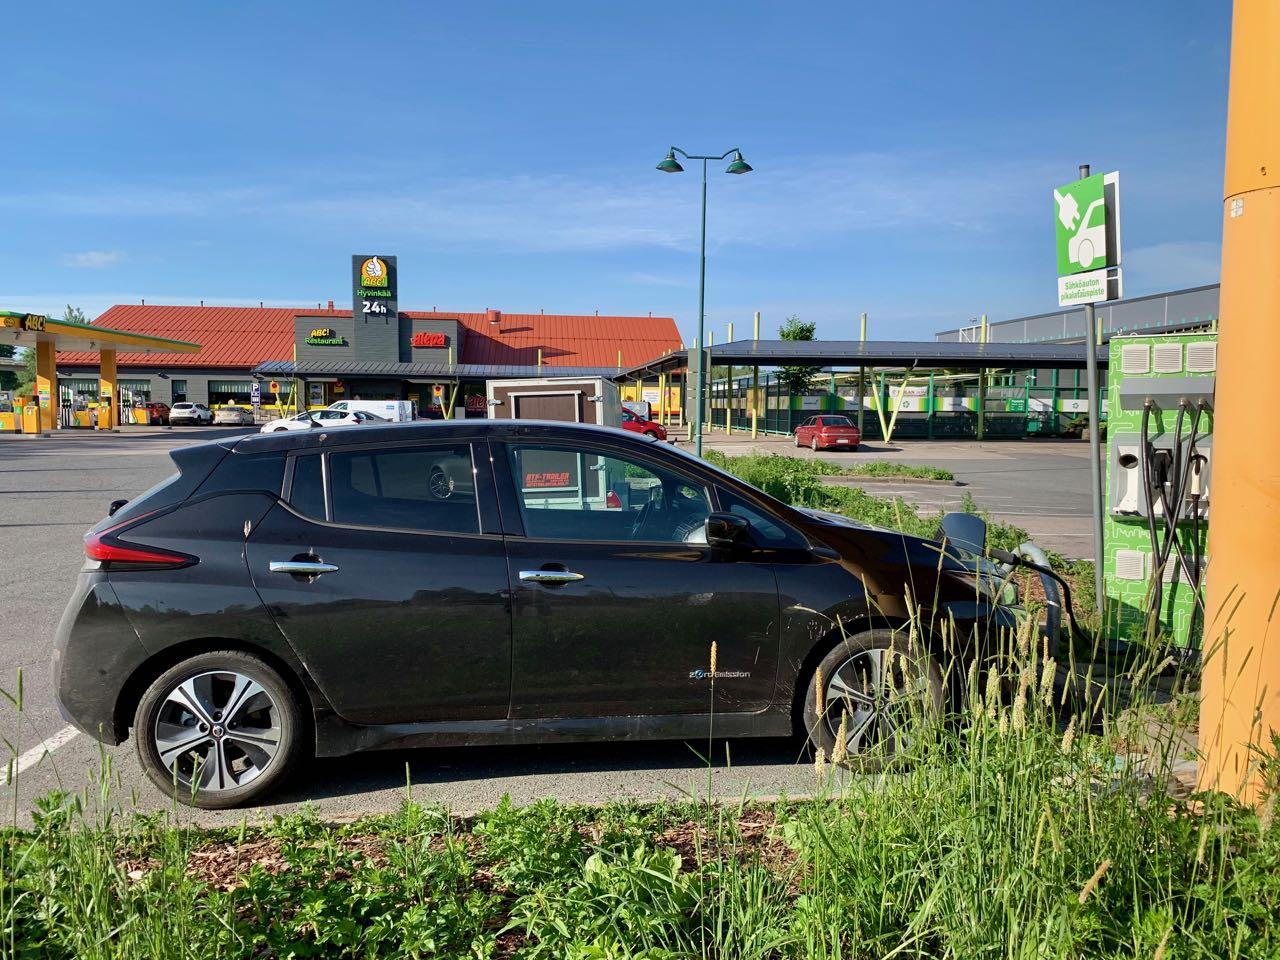 Nissan Leaf 40 kWh ei sovellu #rapidgaten takia Tampere-Helsinki -välin ajamiseen päiväreissuina